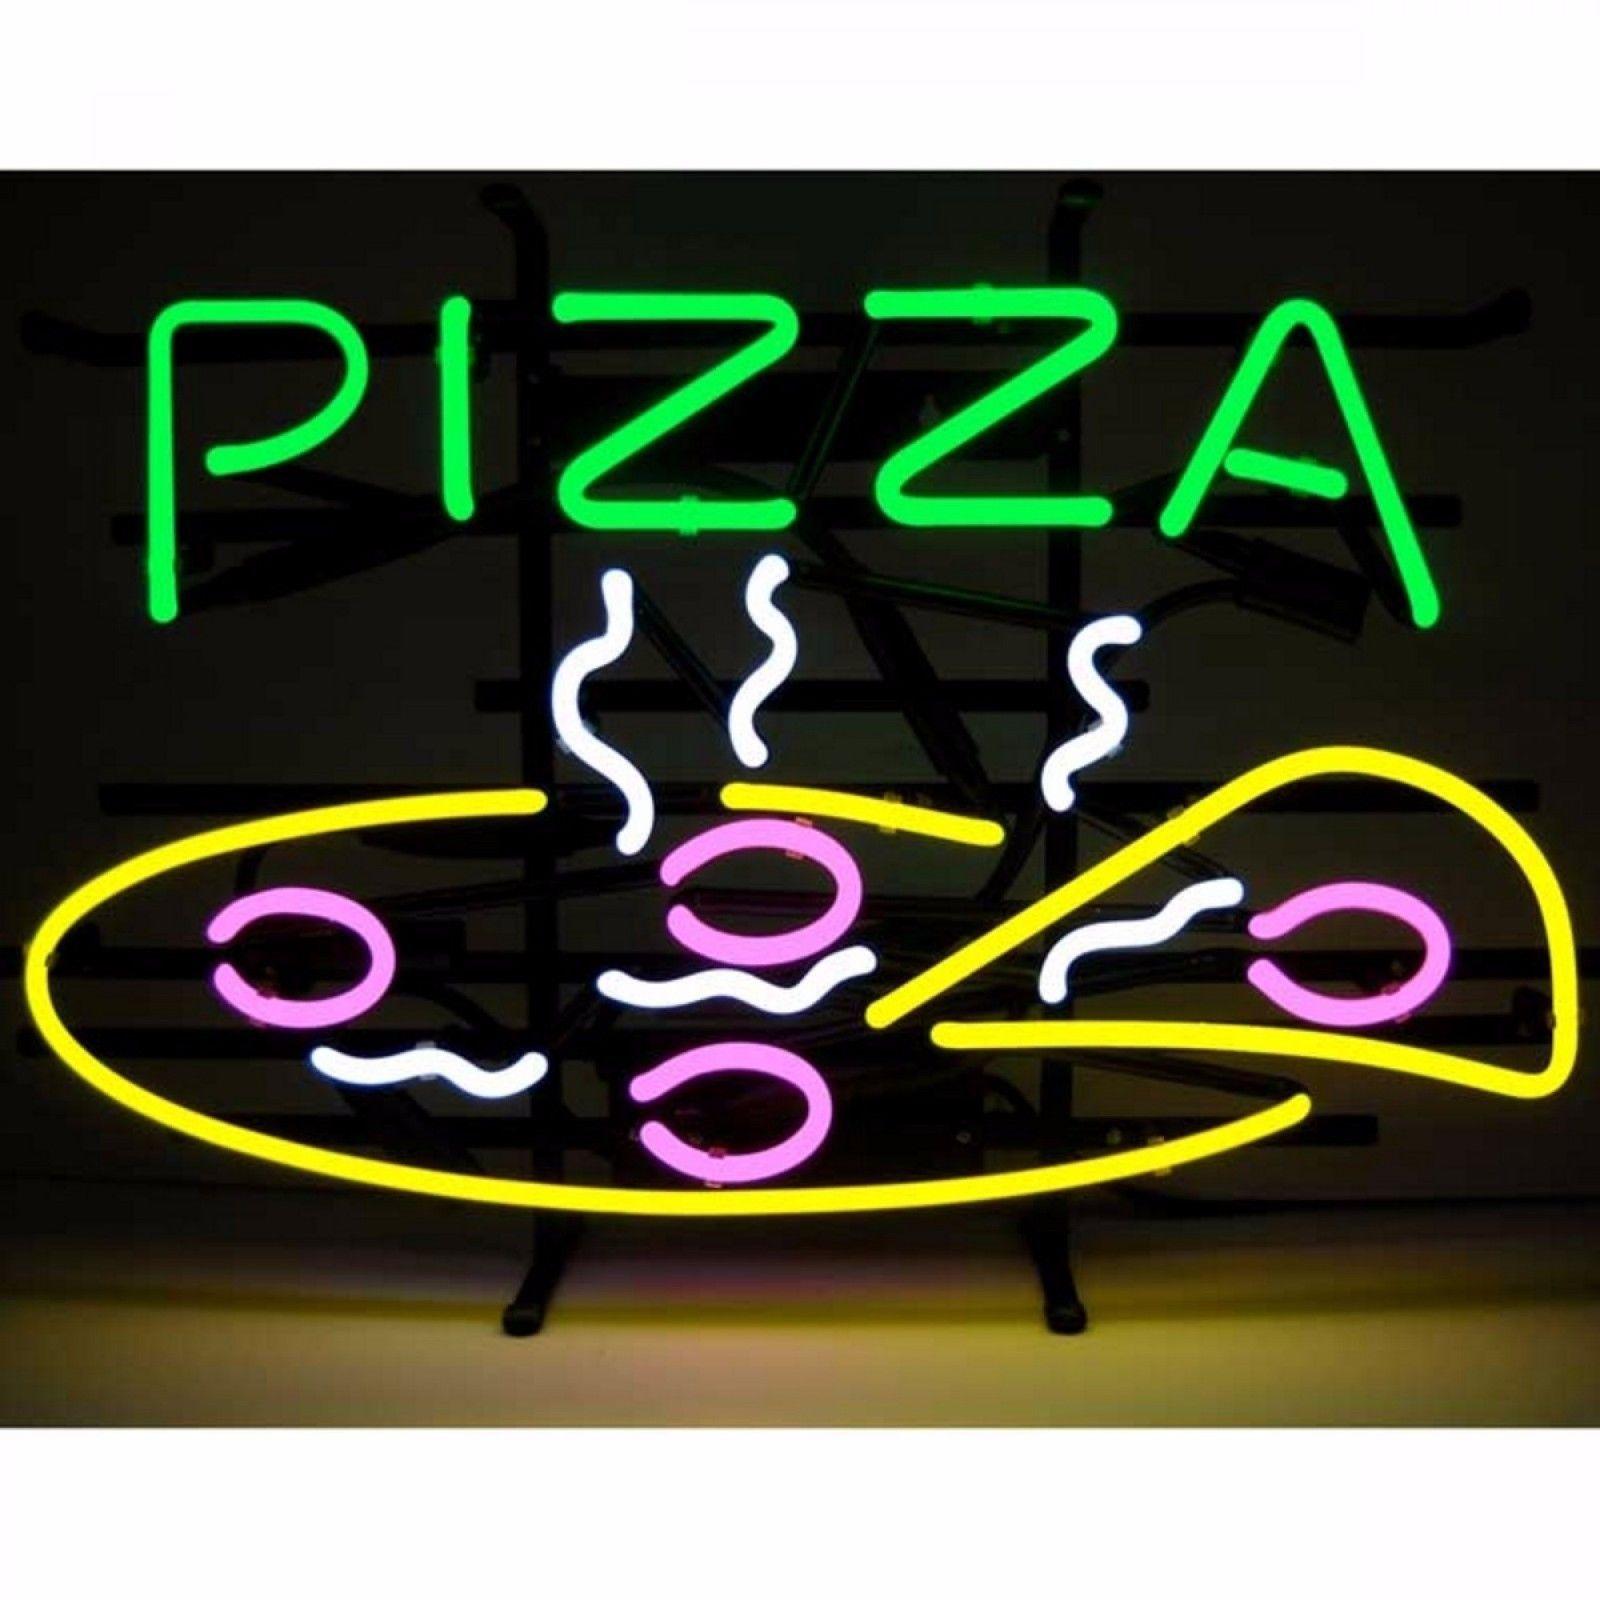 "New Pizza Shop Hamburger Business Open Man Cave Neon Light Sign 24""x20"""